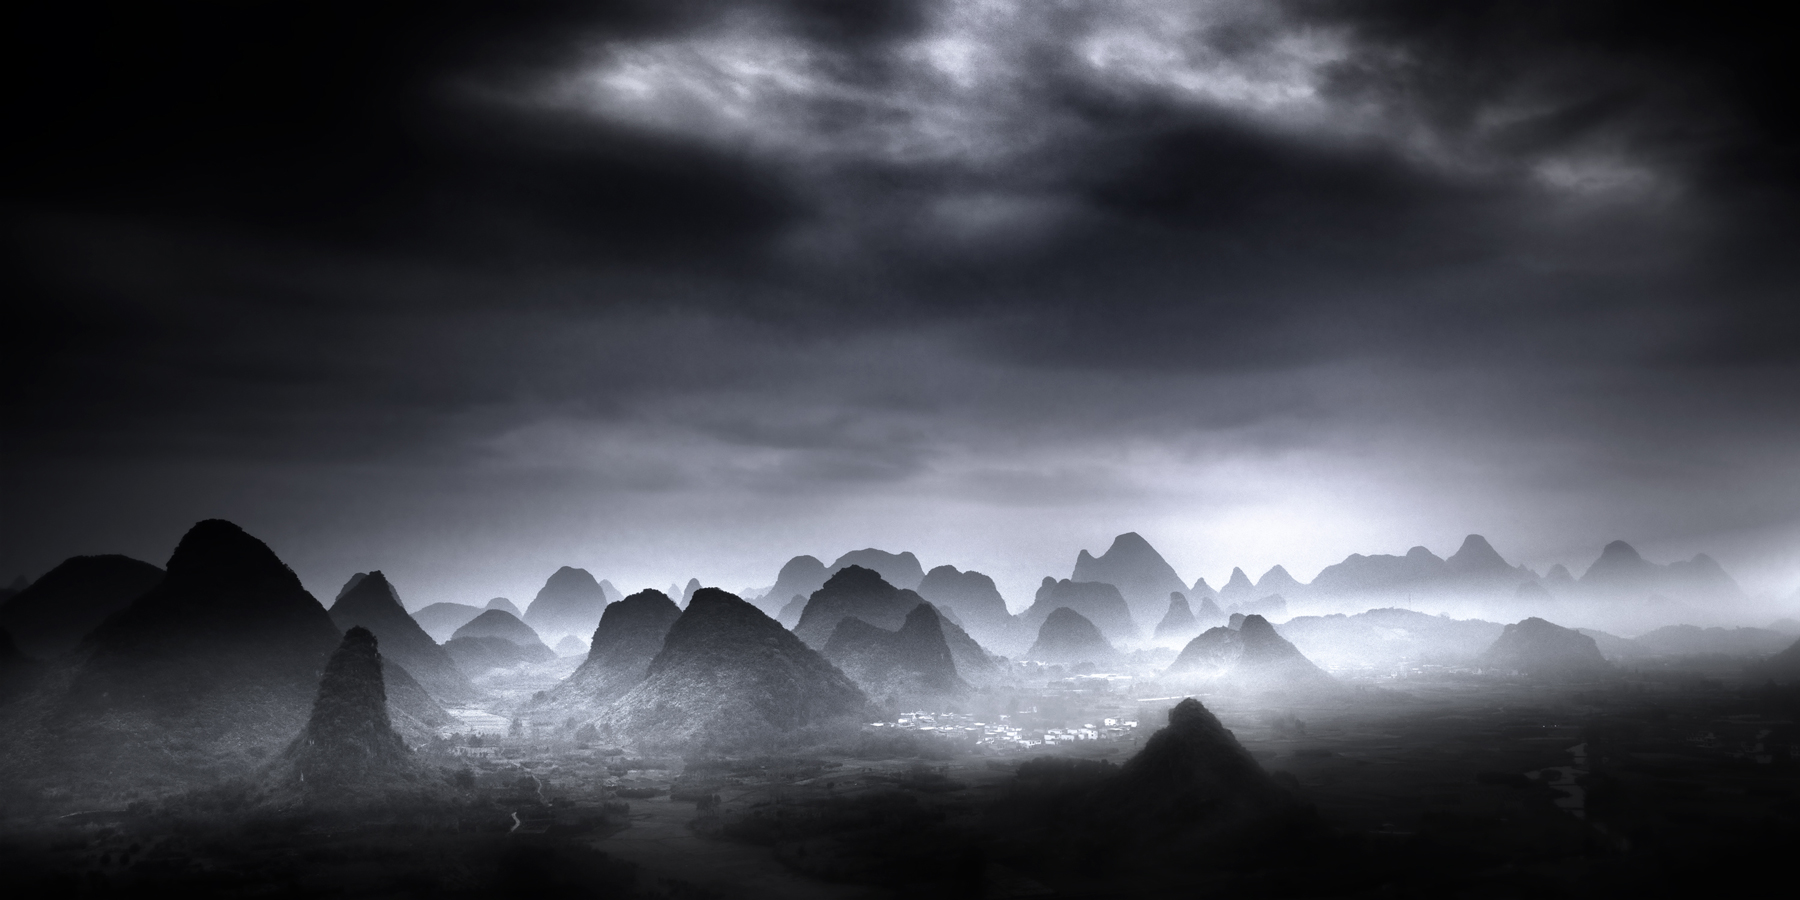 Ghosts - China 2018